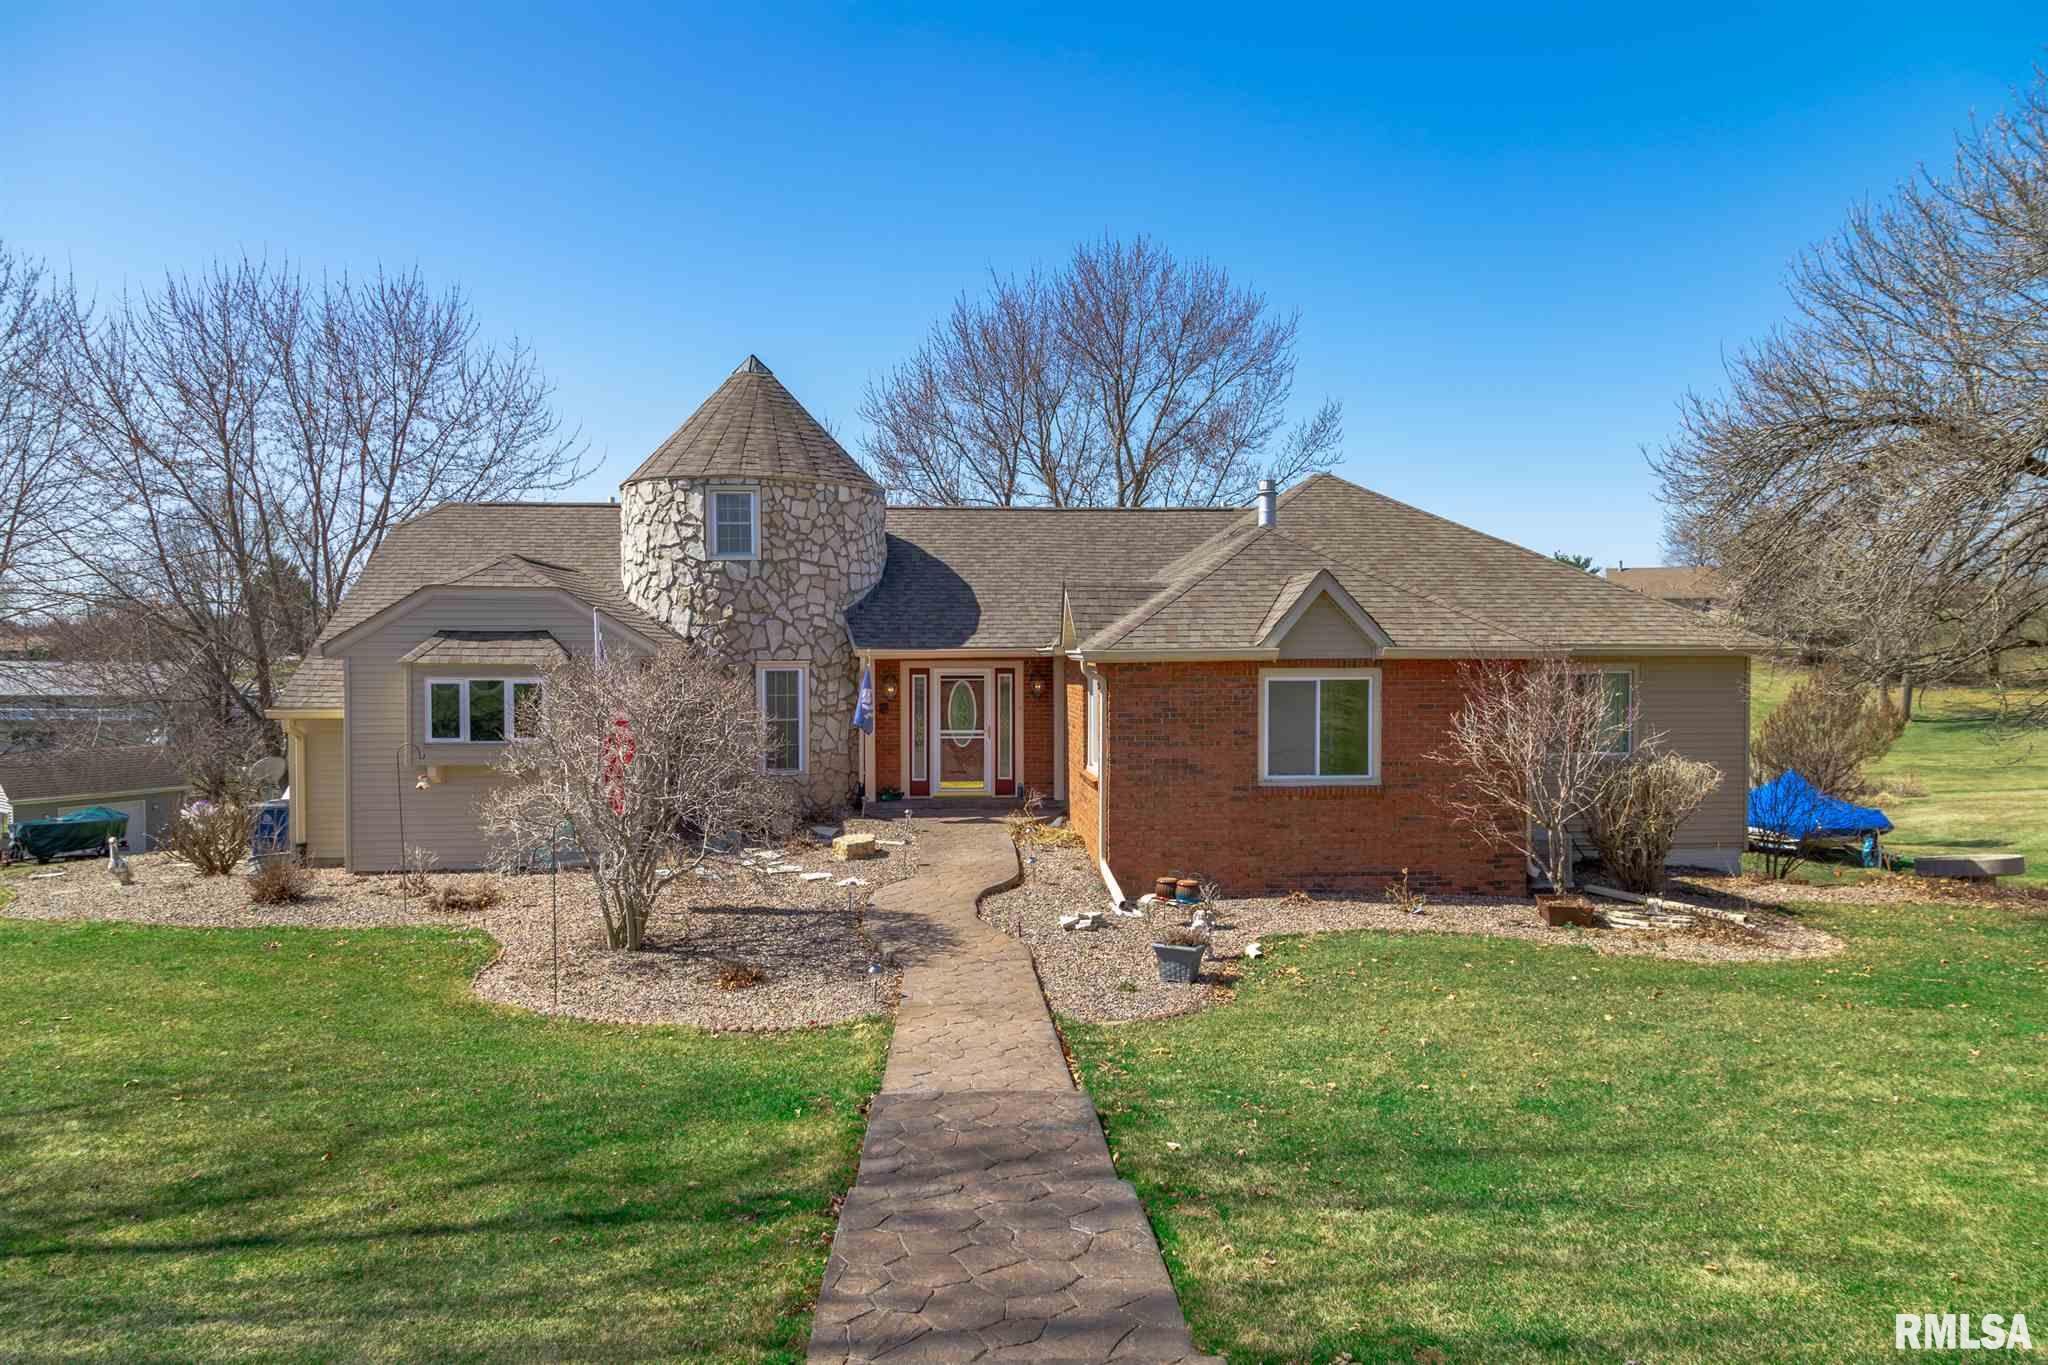 644 SUNCREST Property Photo - Sherrard, IL real estate listing